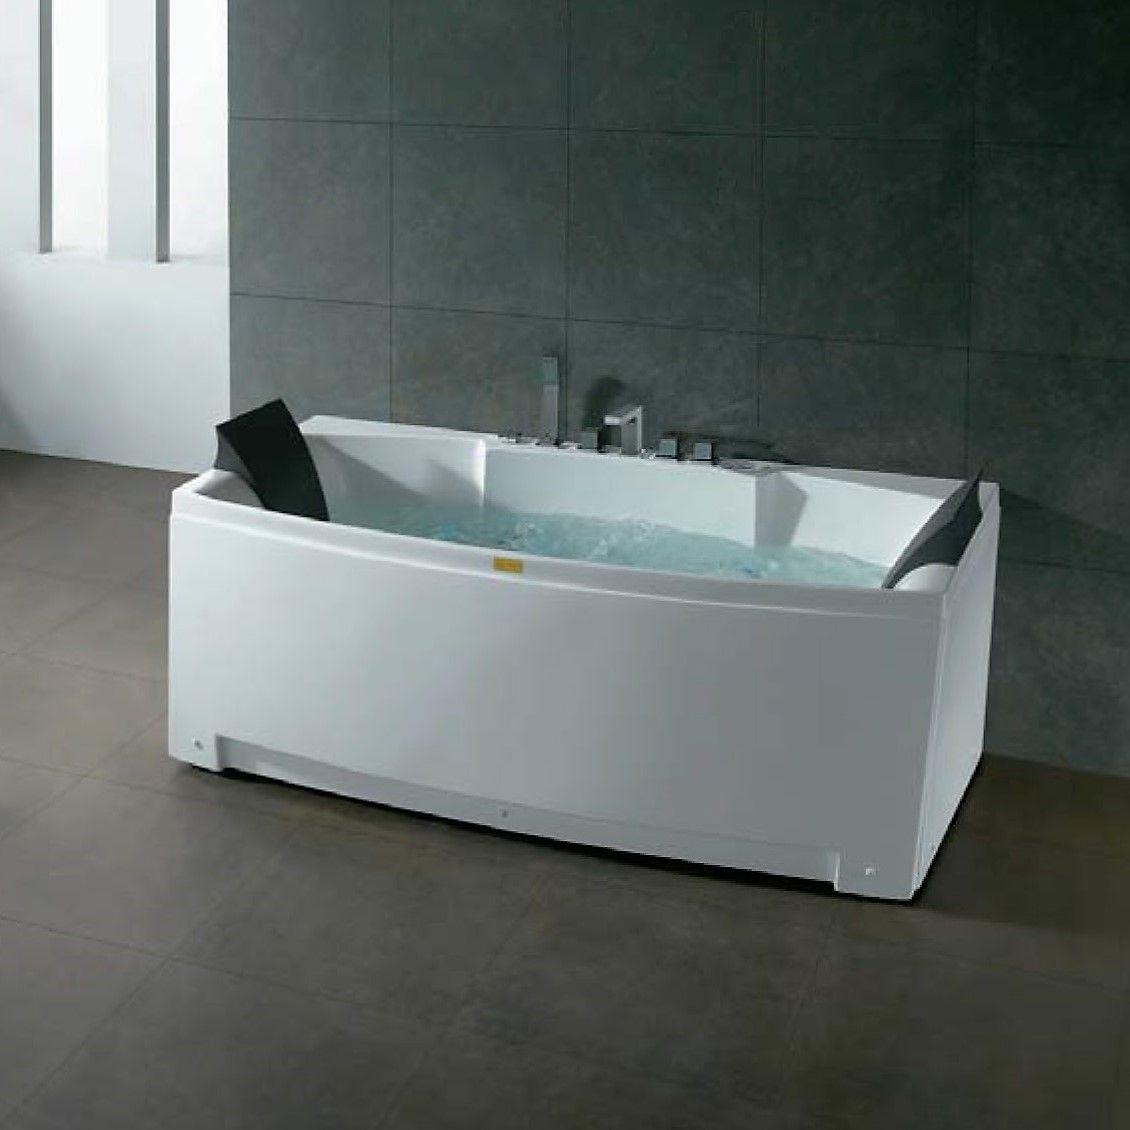 http://www.excella-worldwide.com/   Bathtubs   Pinterest   Bathtubs